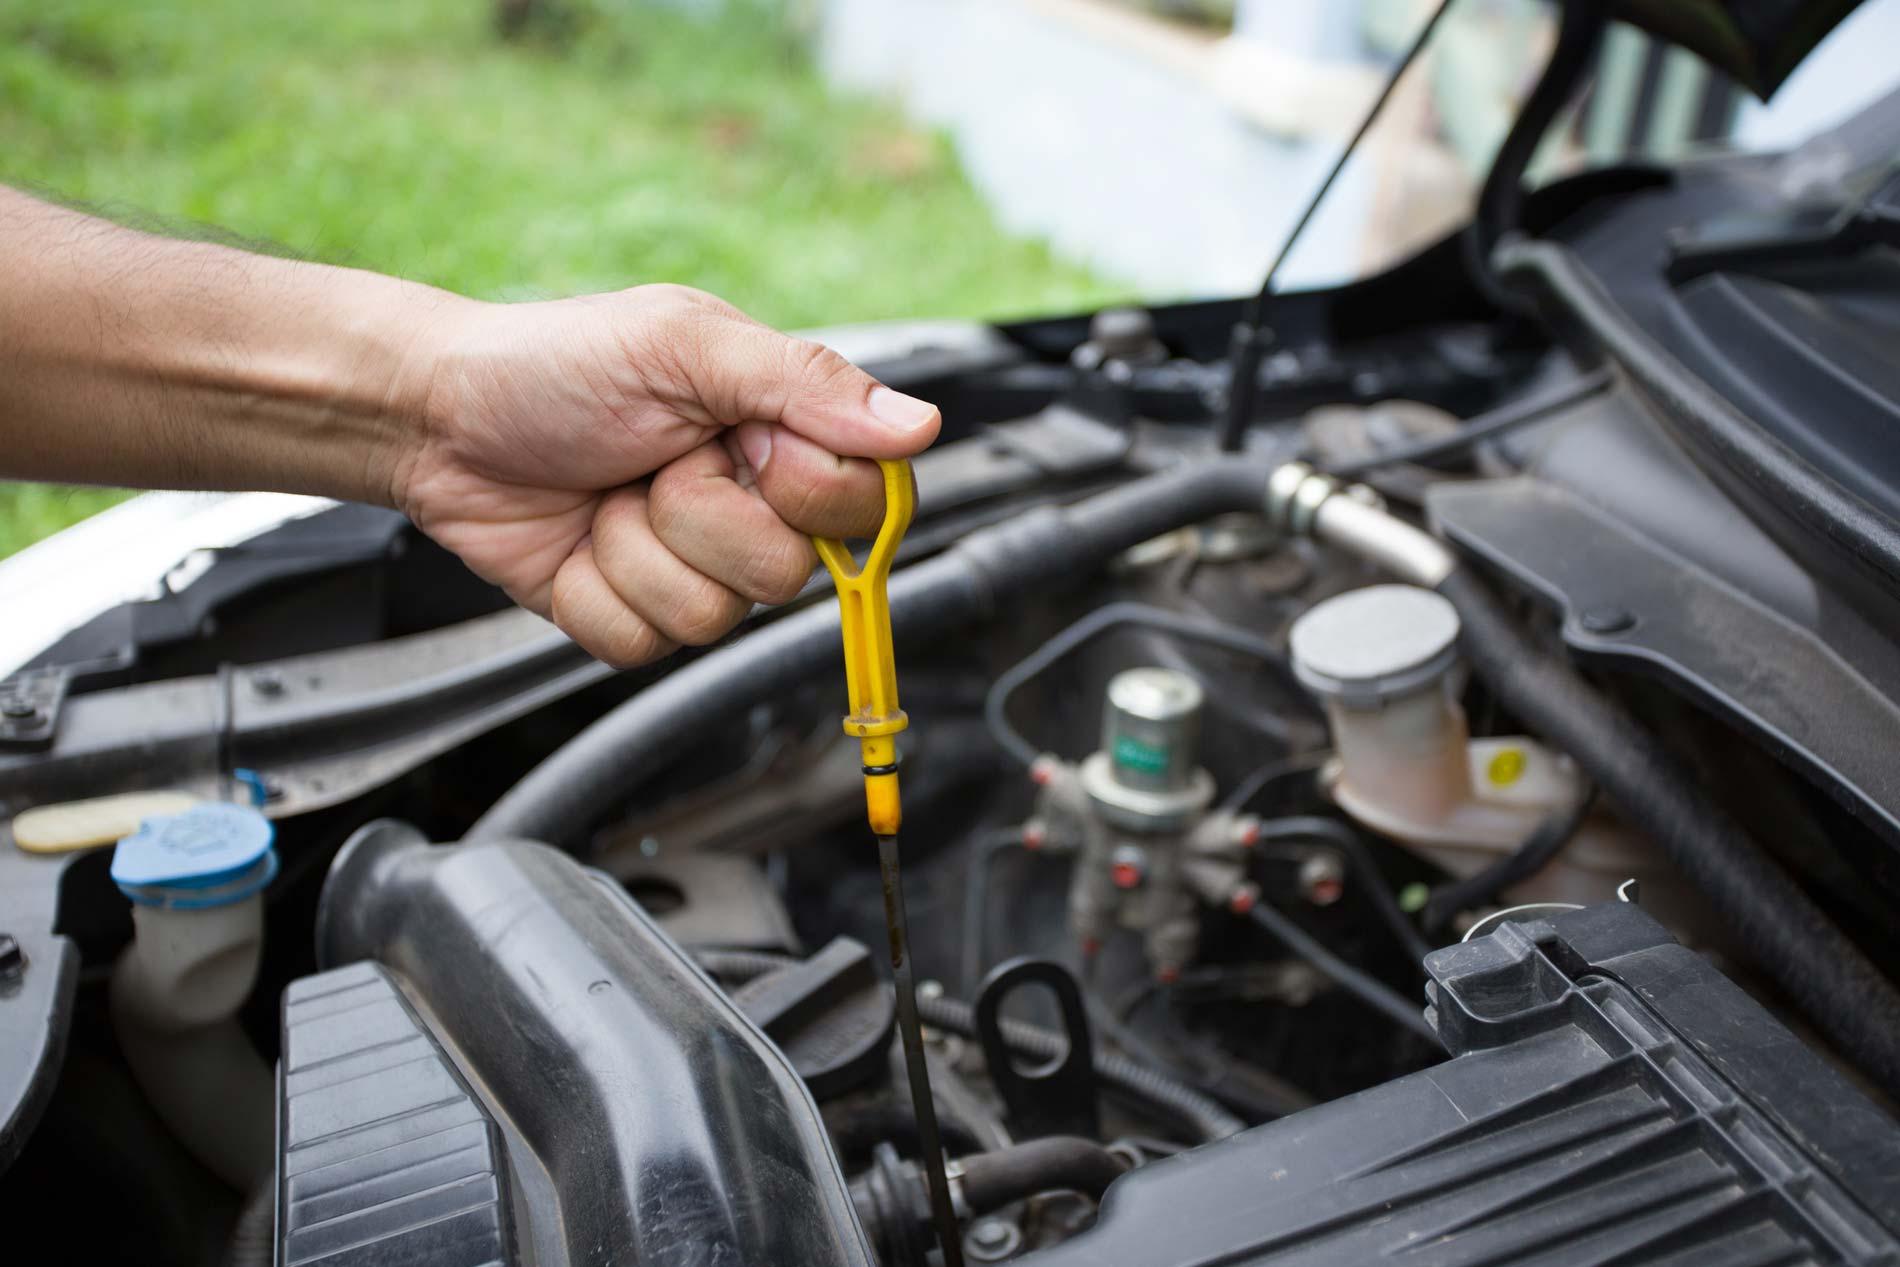 Person checking oil in car